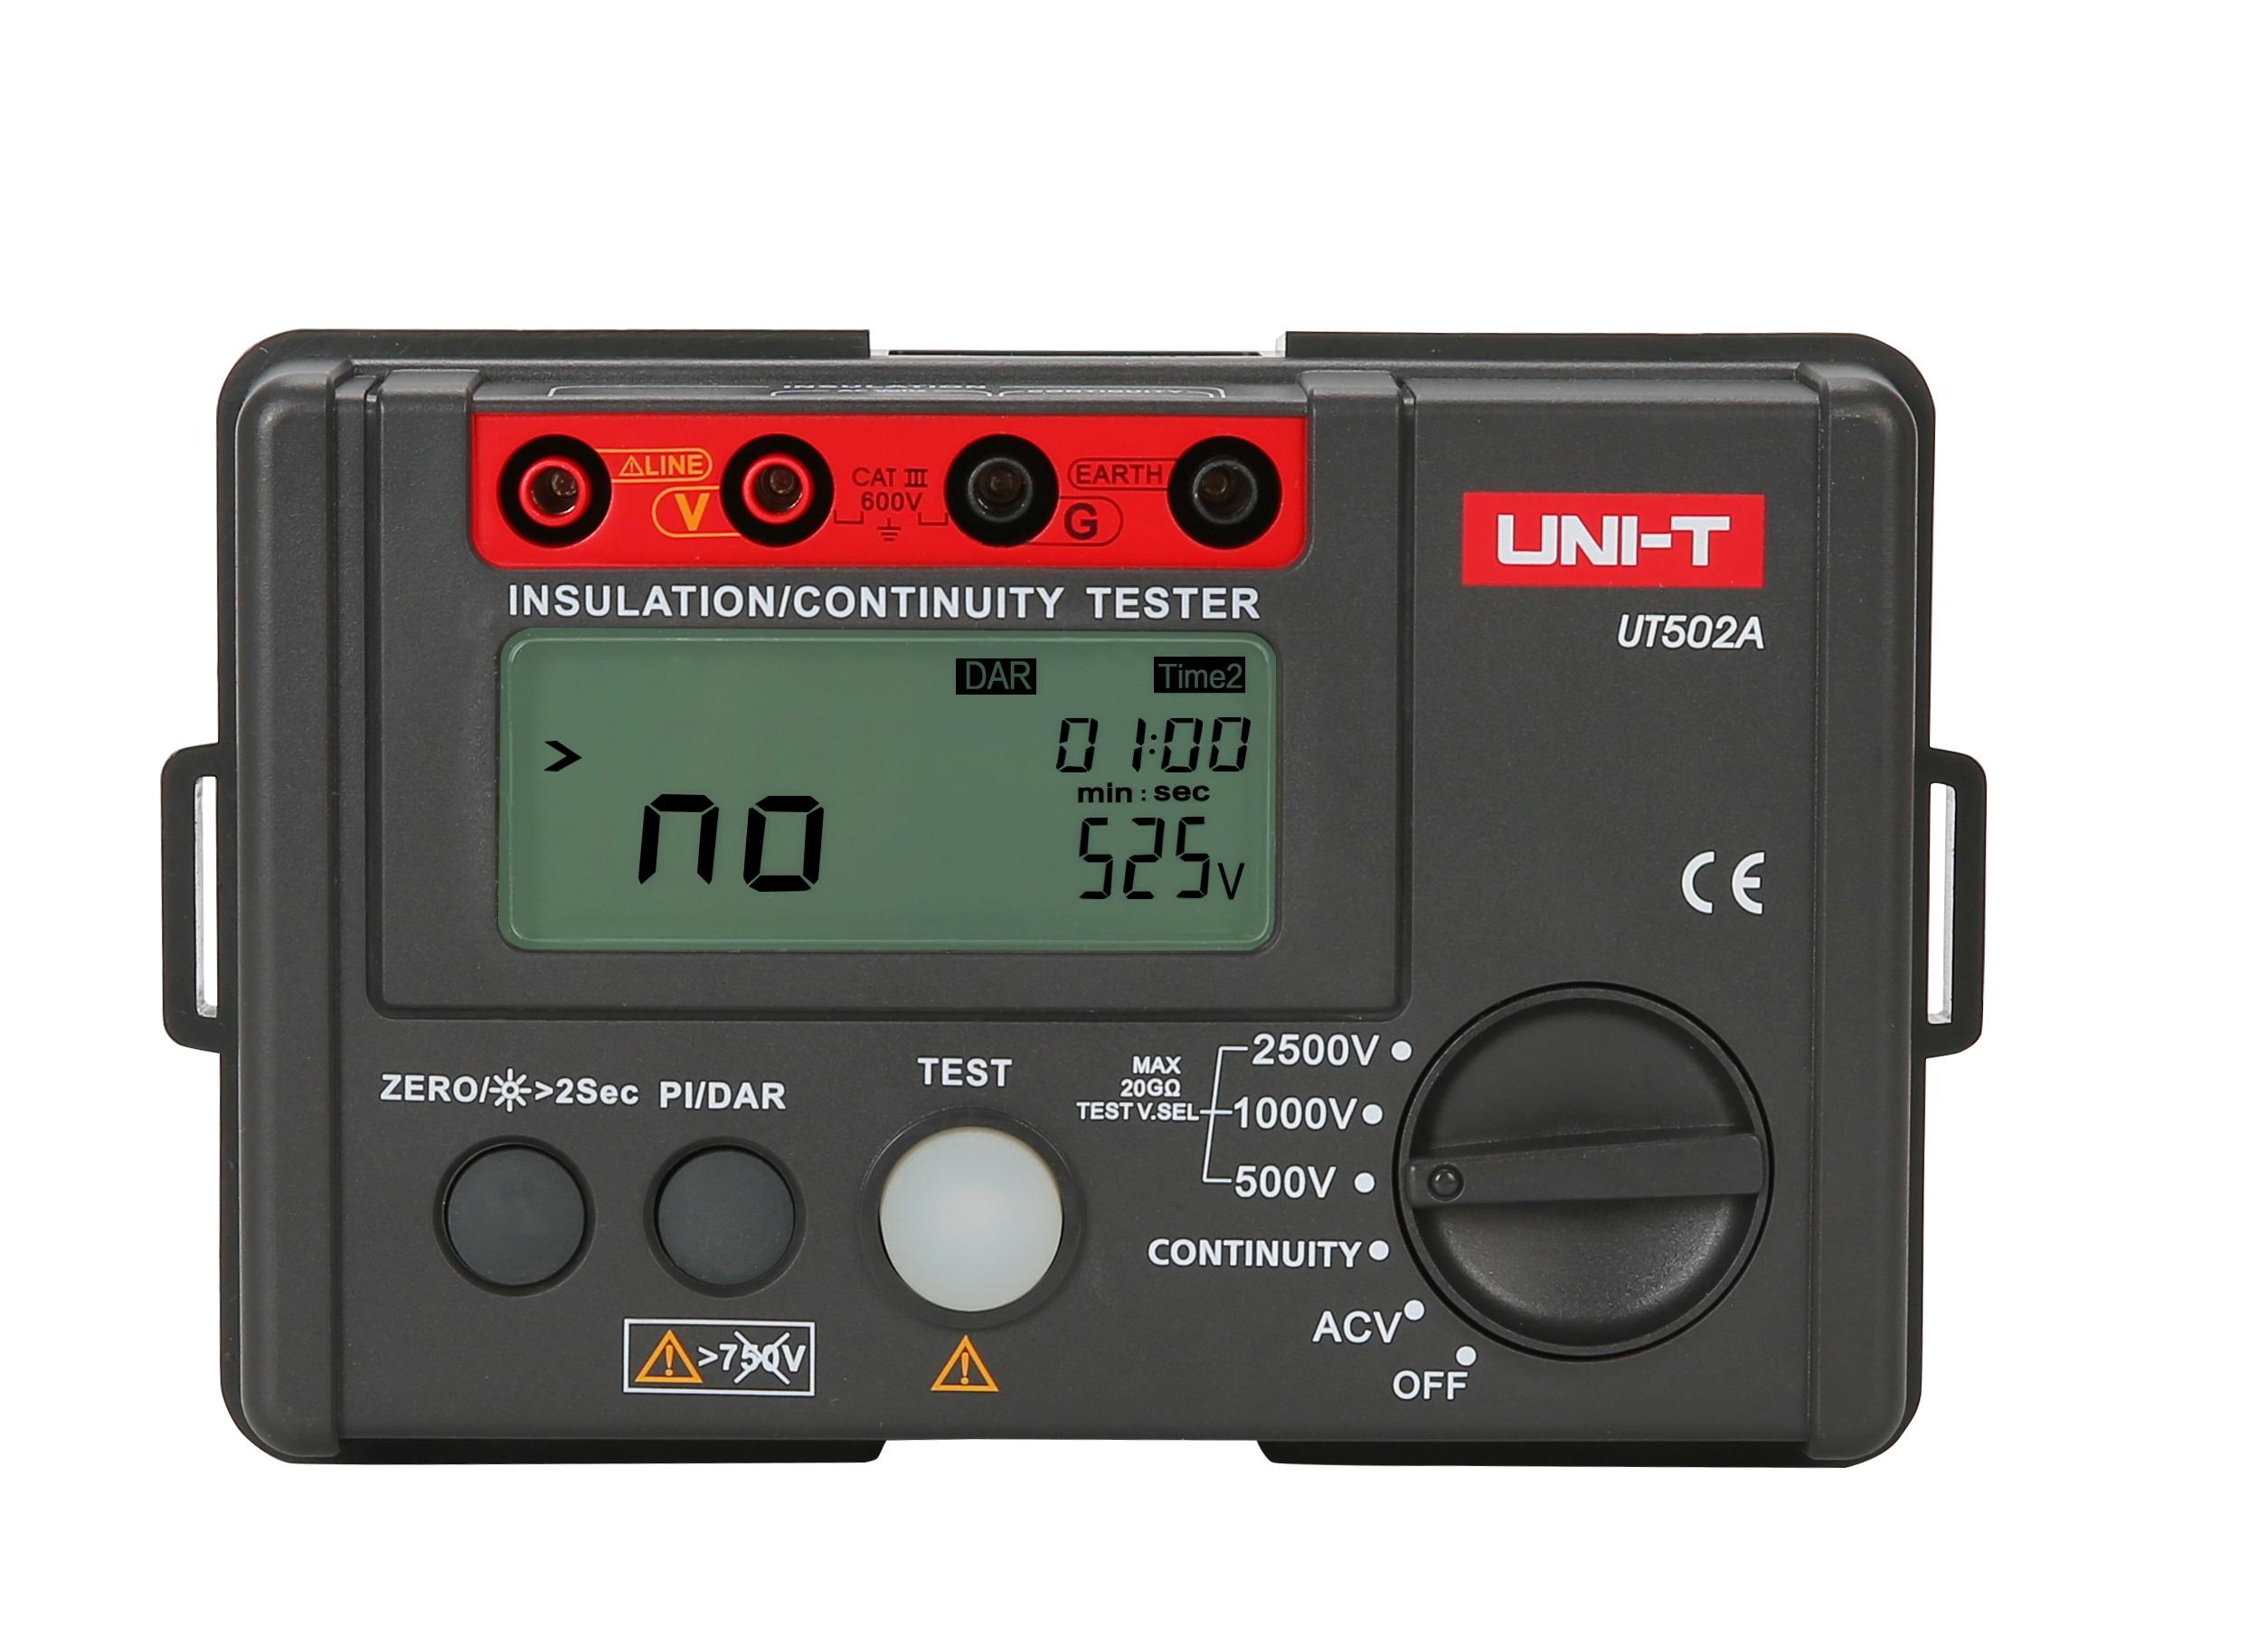 UNI-T UT502A - Insulation Resistance Tester 500-2500V; 30V-1000V